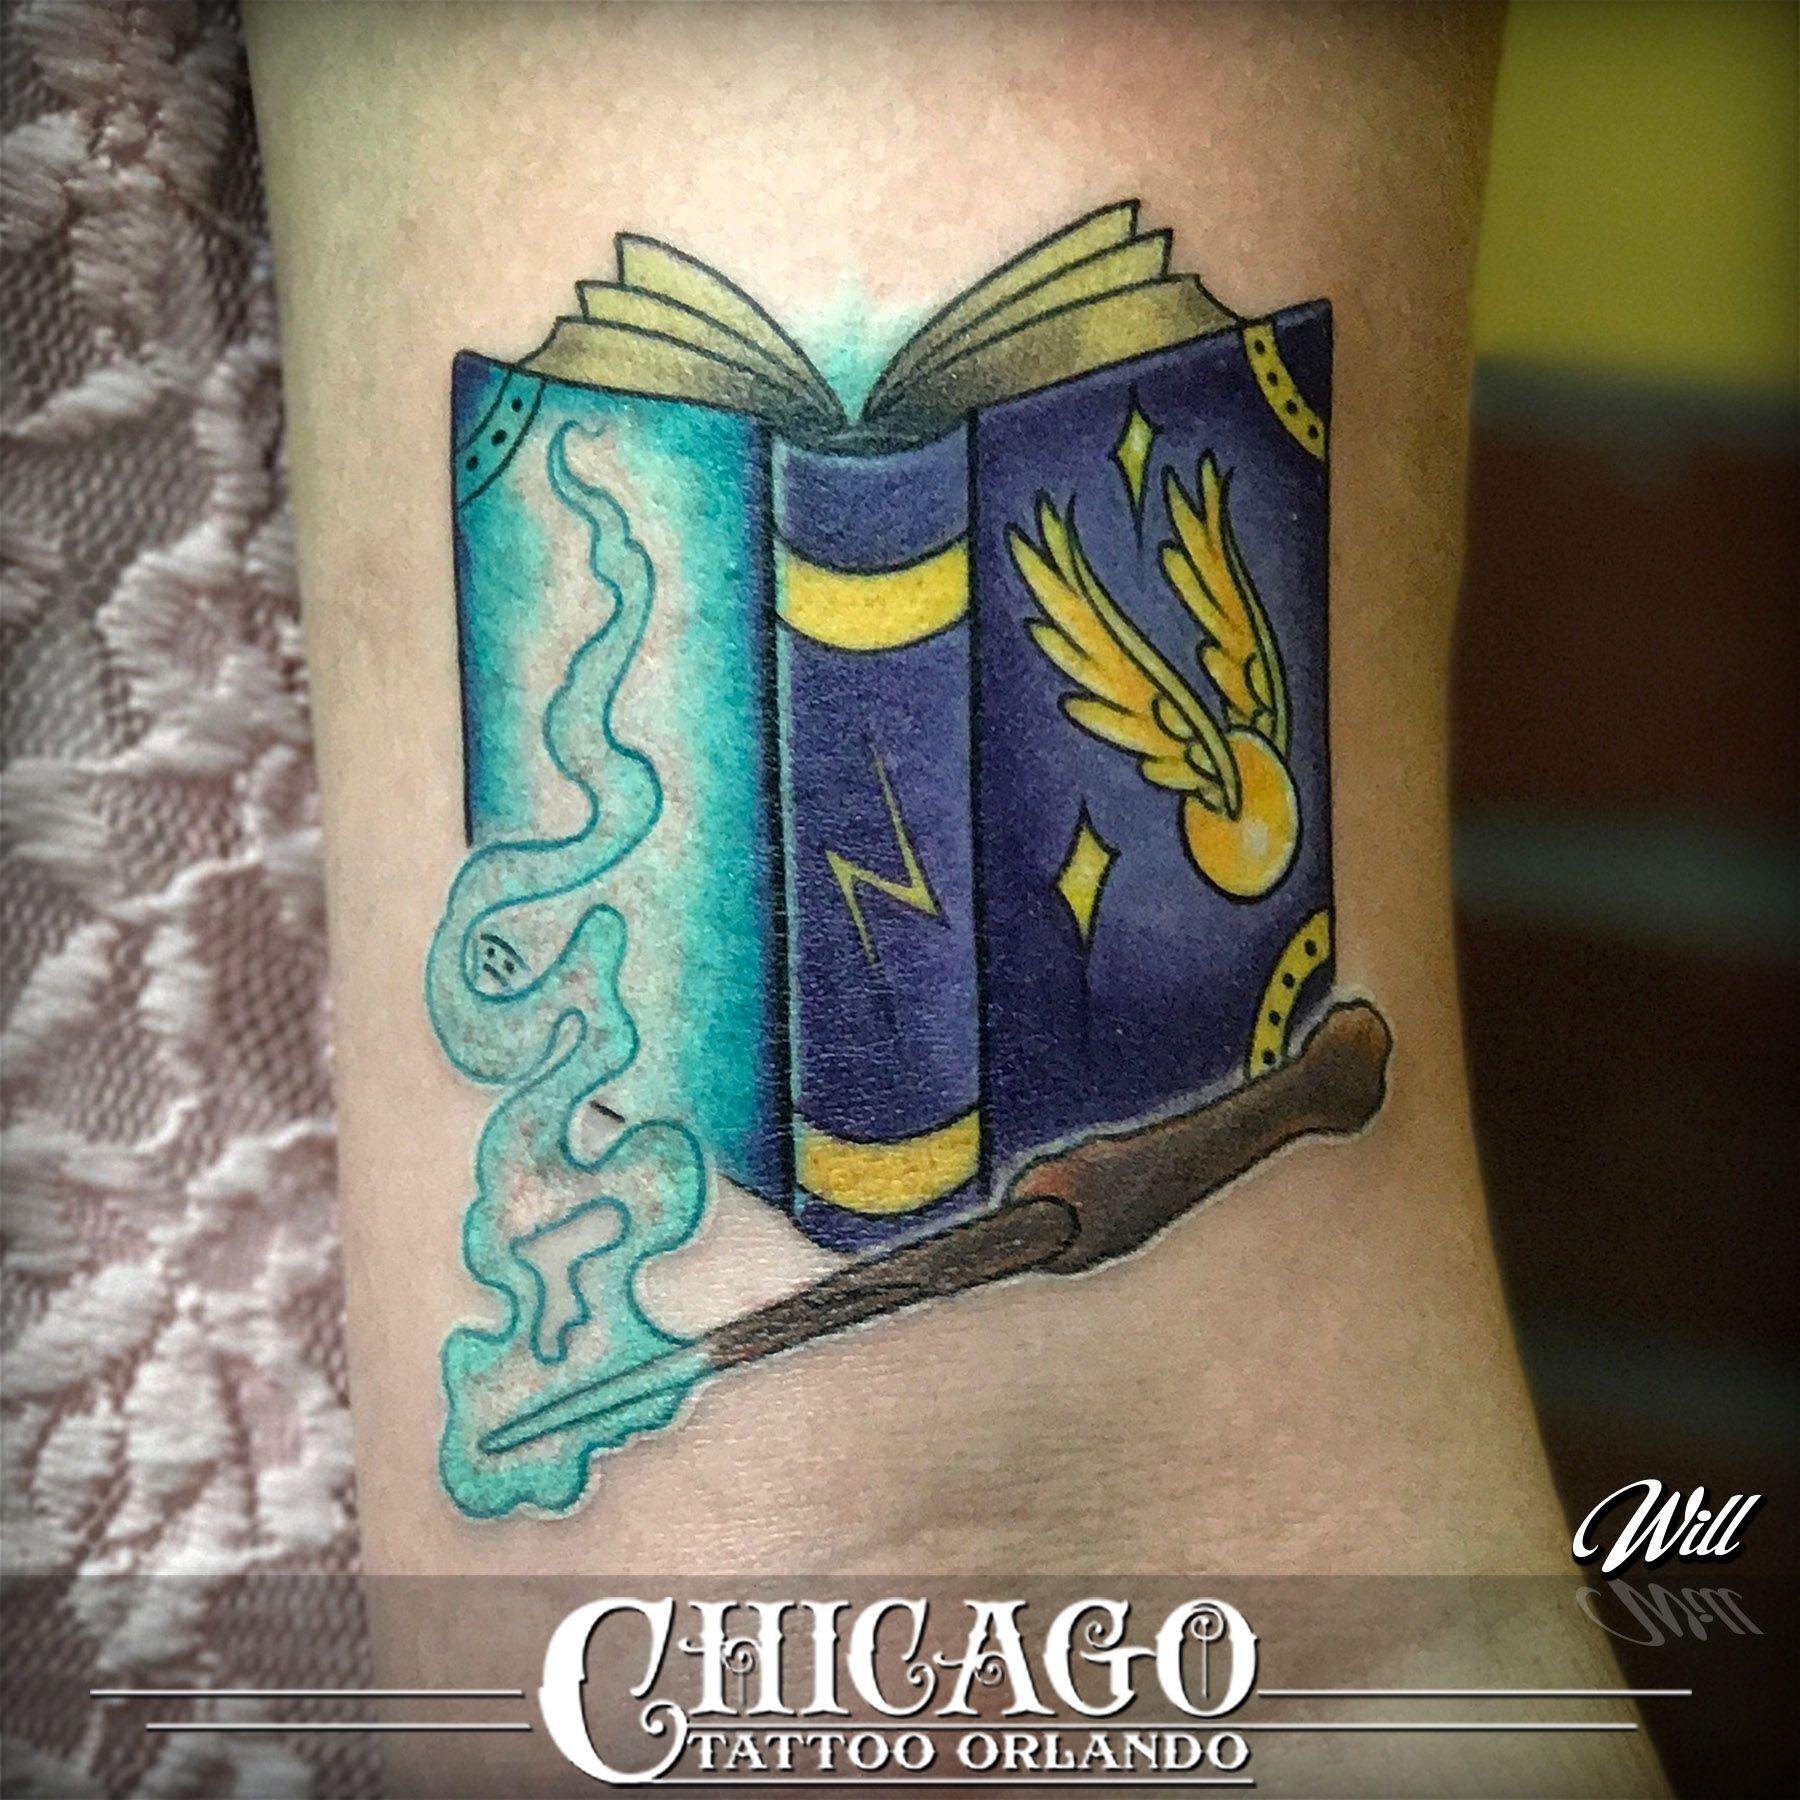 Meet will chicago tattoo tattoos orlando